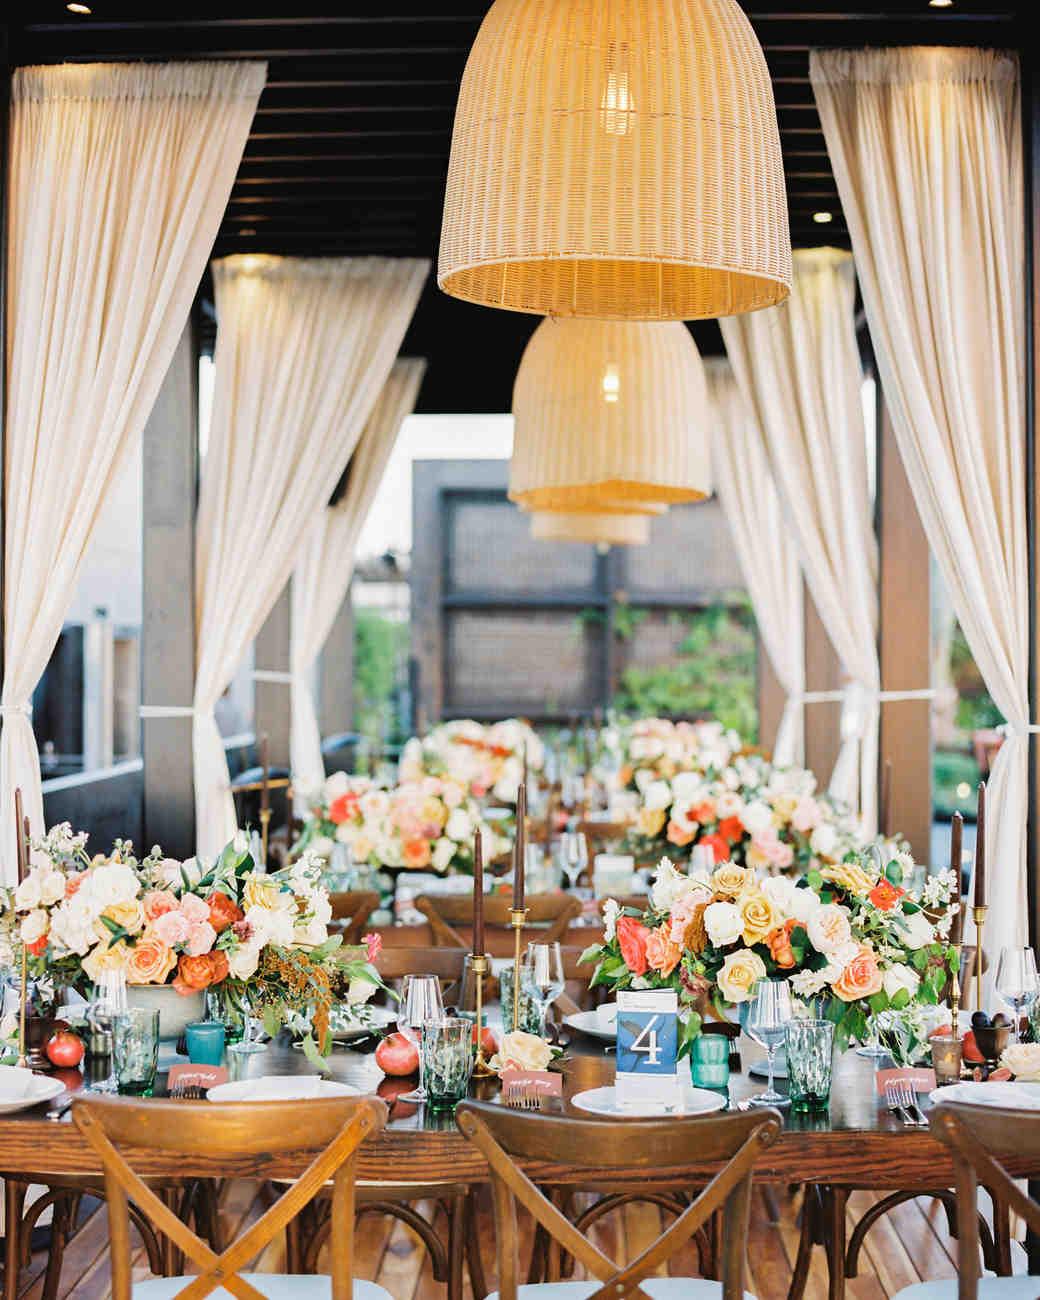 A Table Setup for a Wedding Reception